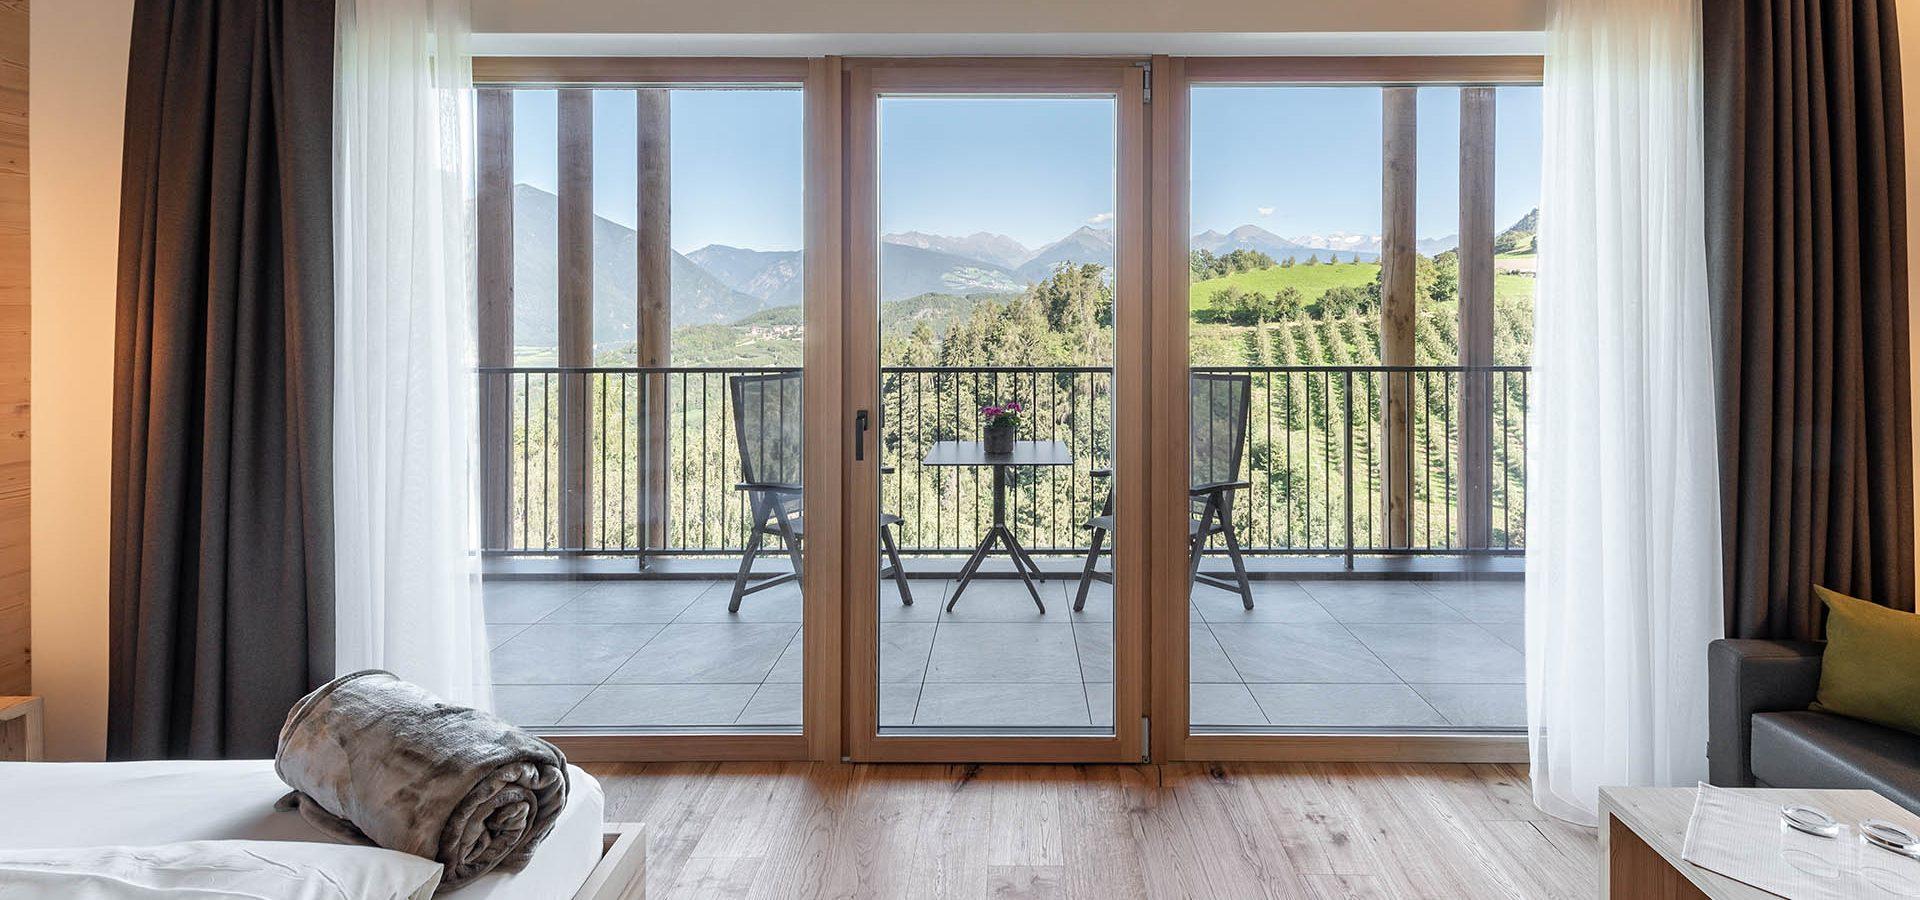 Torgglerhof in Südtirol - Das Panoramahotel über Brixen – Plose